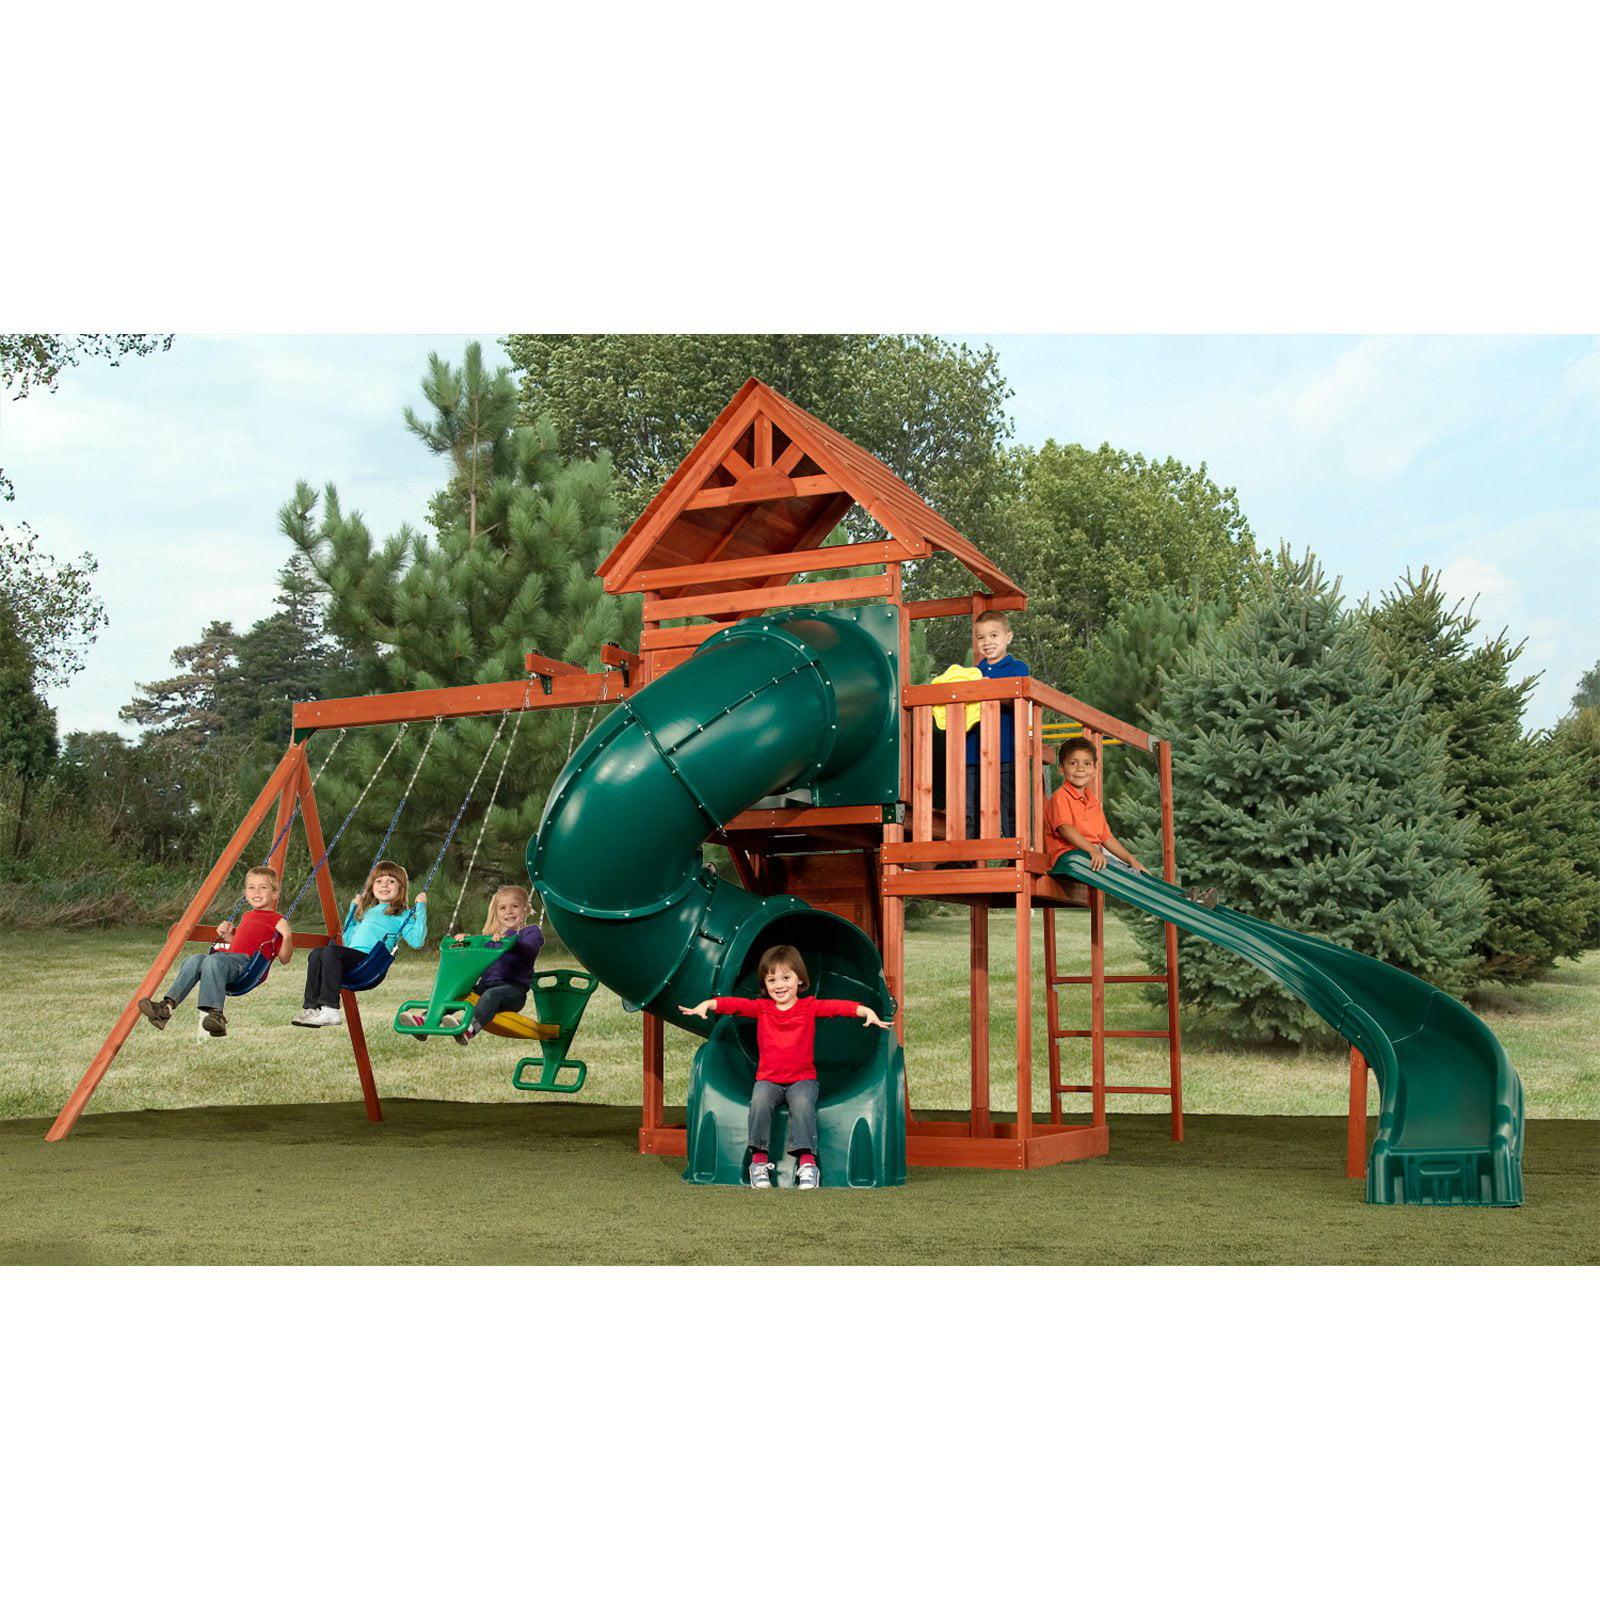 swingnslide grandview twist wood swing set outdoor play backyard playset kids